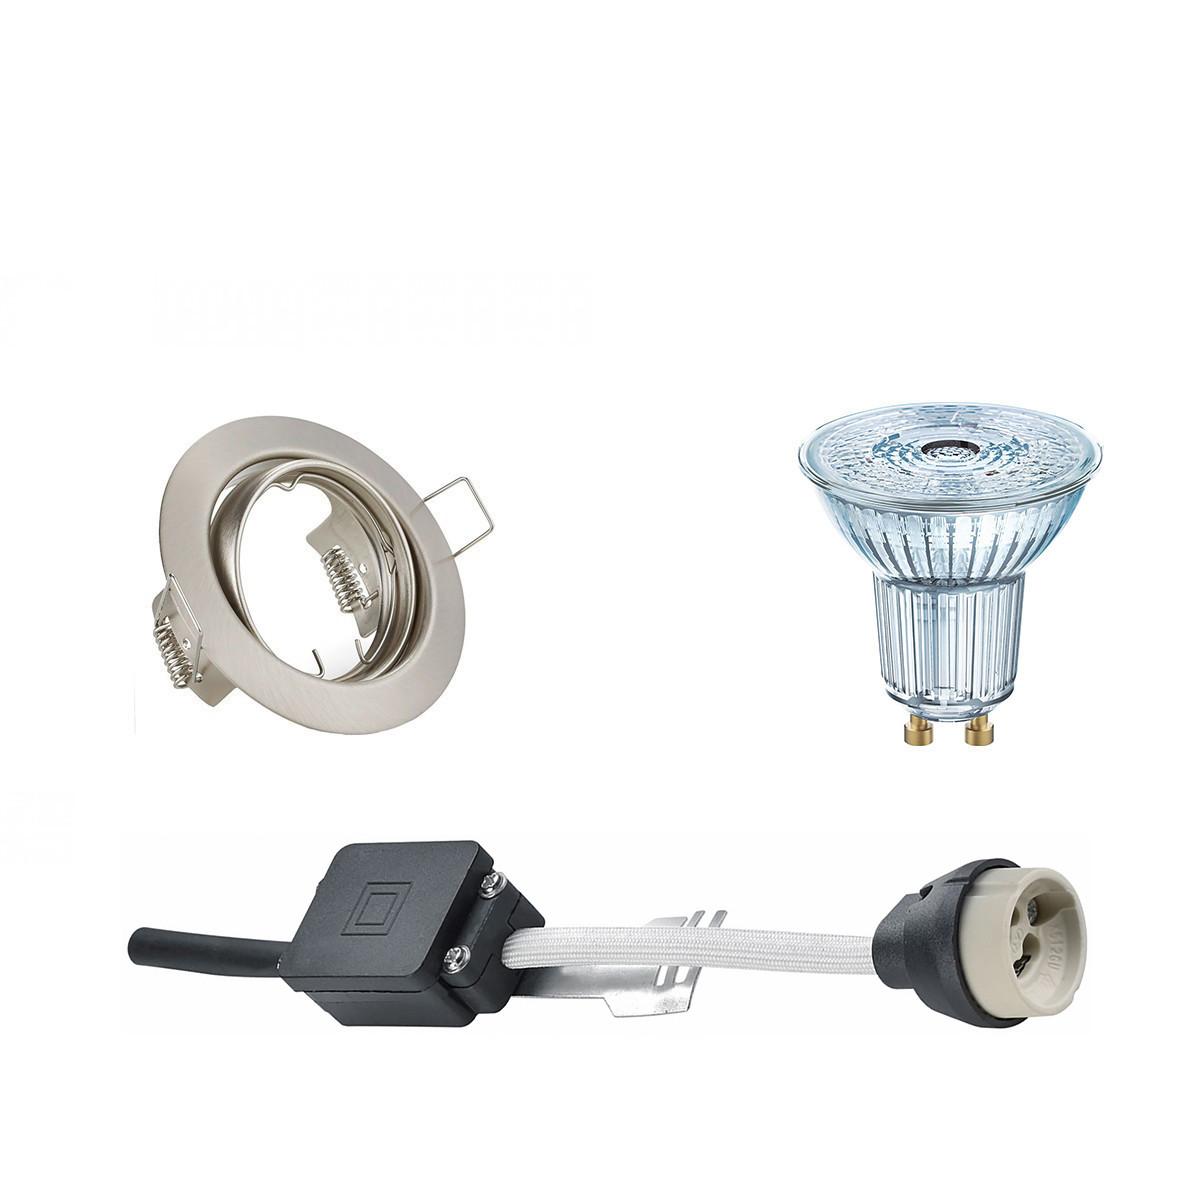 OSRAM - LED Spot Set - Parathom PAR16 940 36D - GU10 Fitting - Dimbaar - Inbouw Rond - Mat Nikkel -